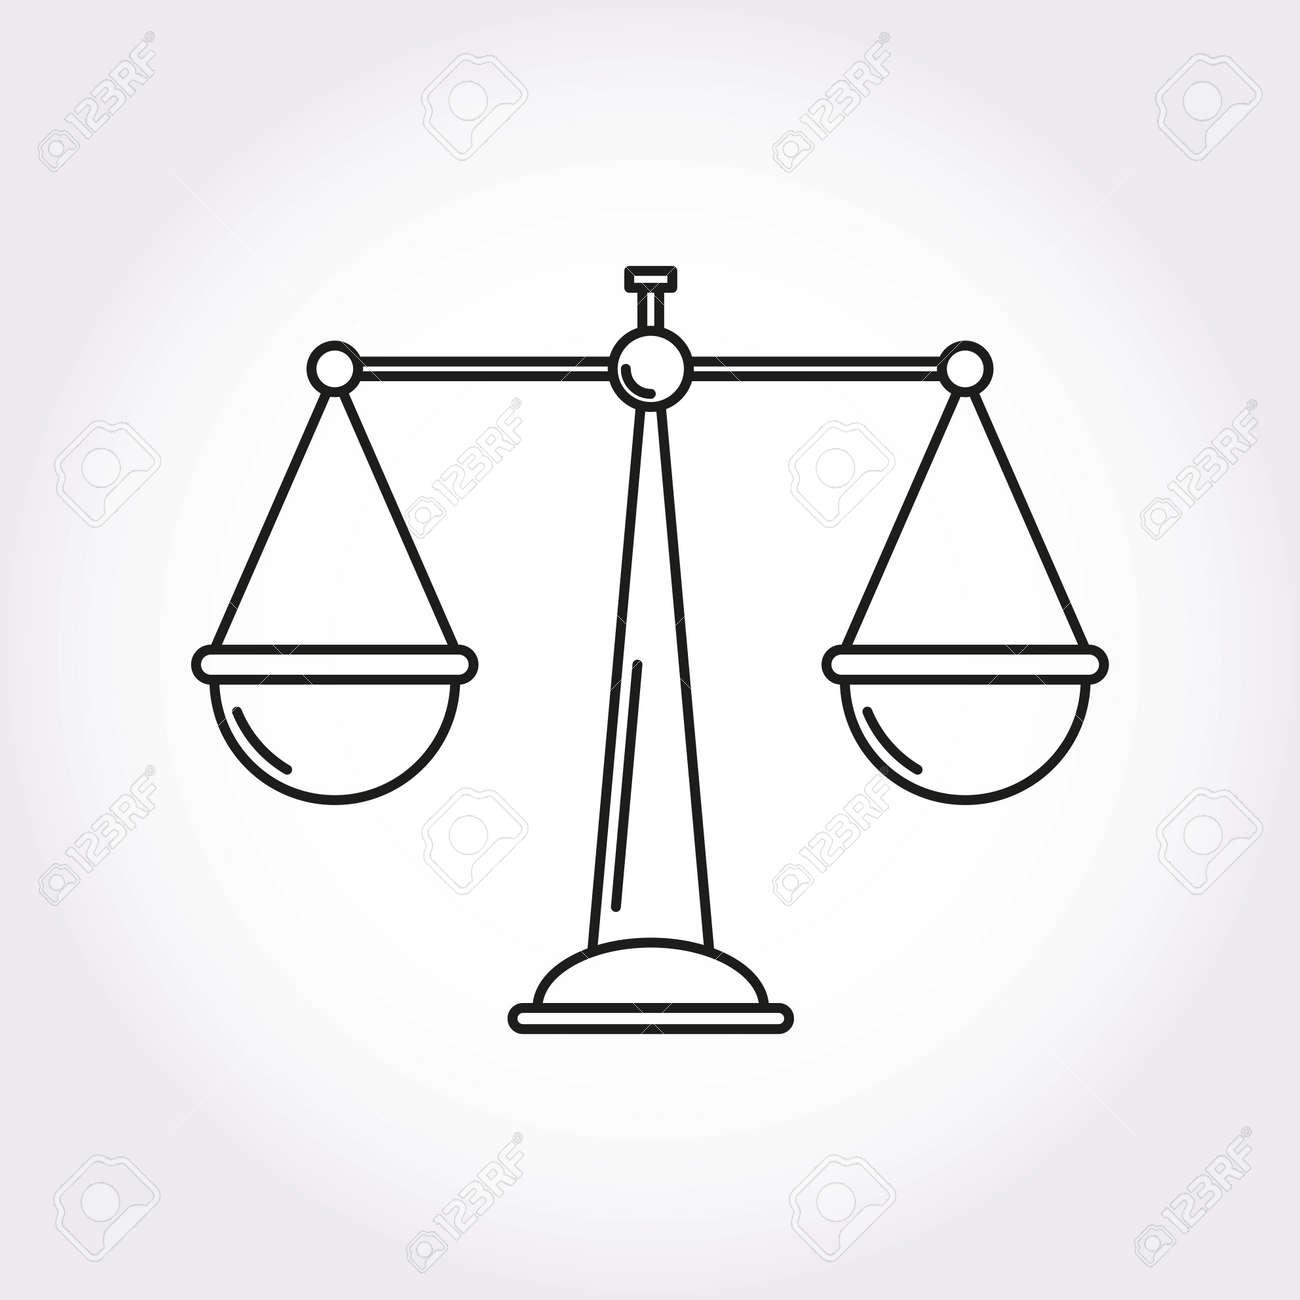 Balance Justice libra balance justice modern style icon symbol royalty free cliparts